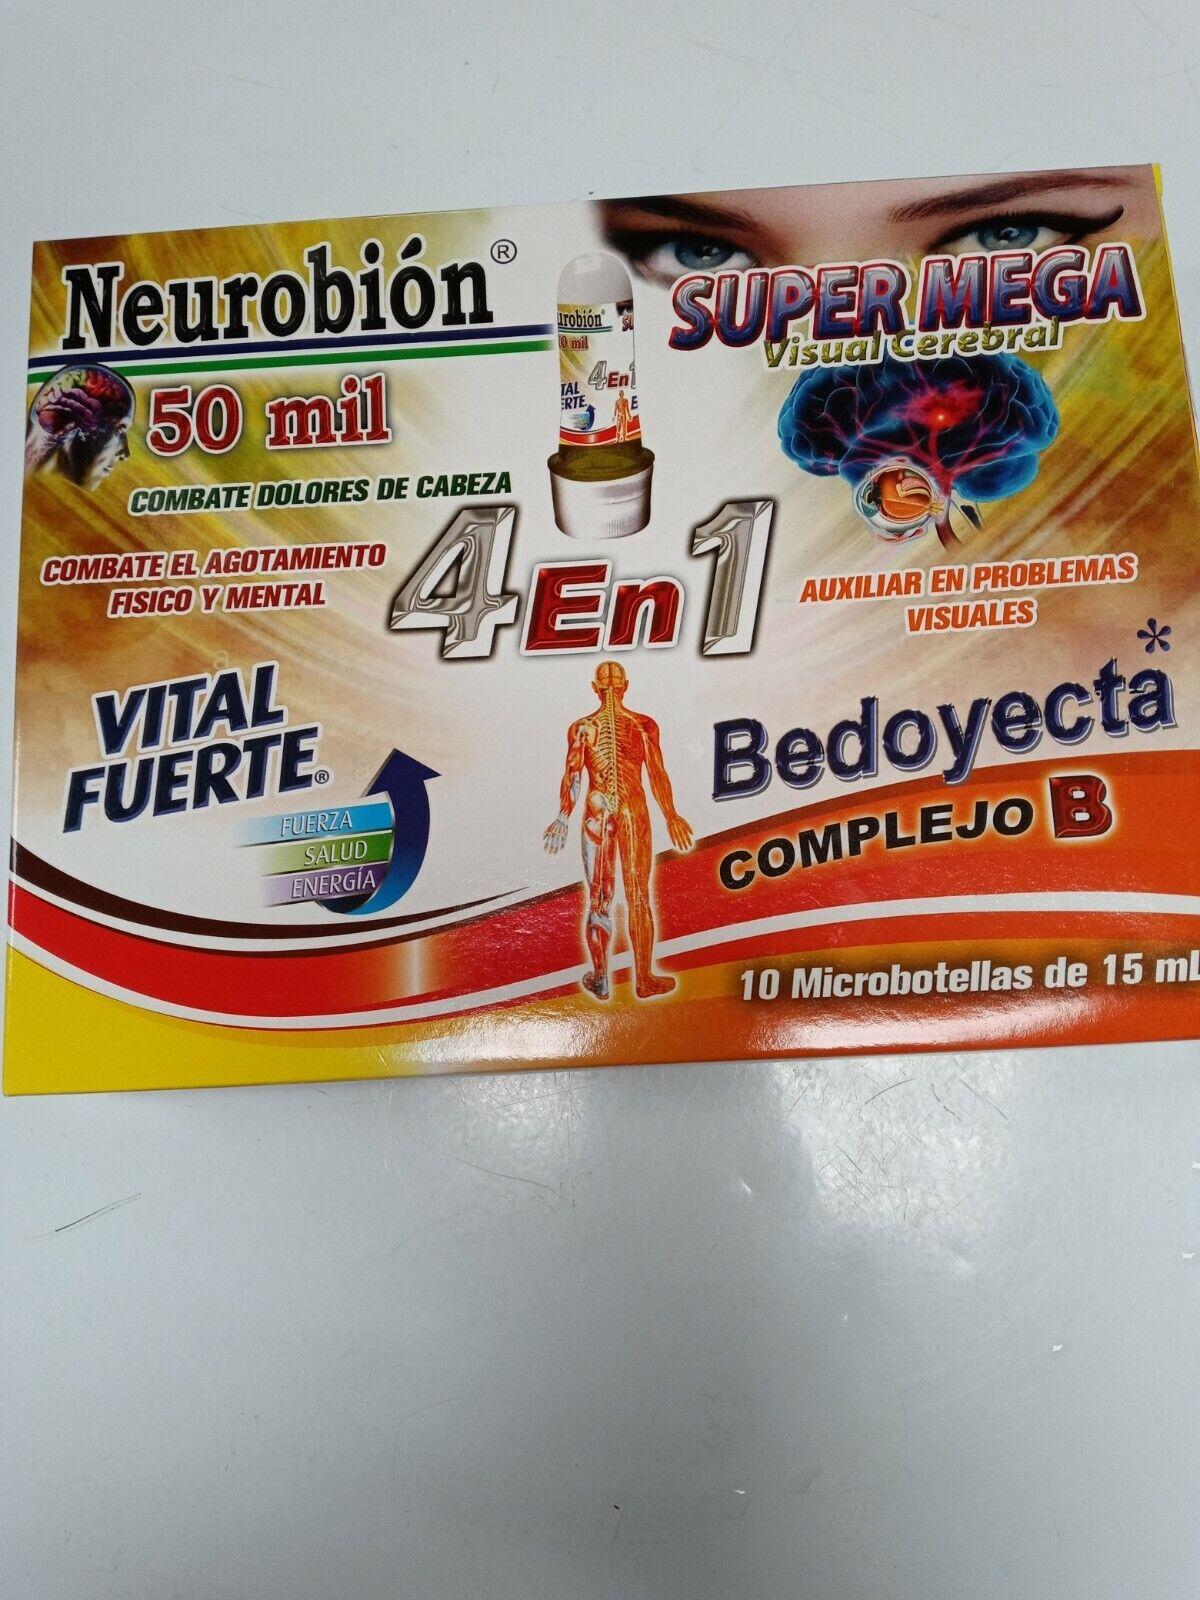 Neurobion 4 en 1 super mega, vital fuerte ,bedoyecta